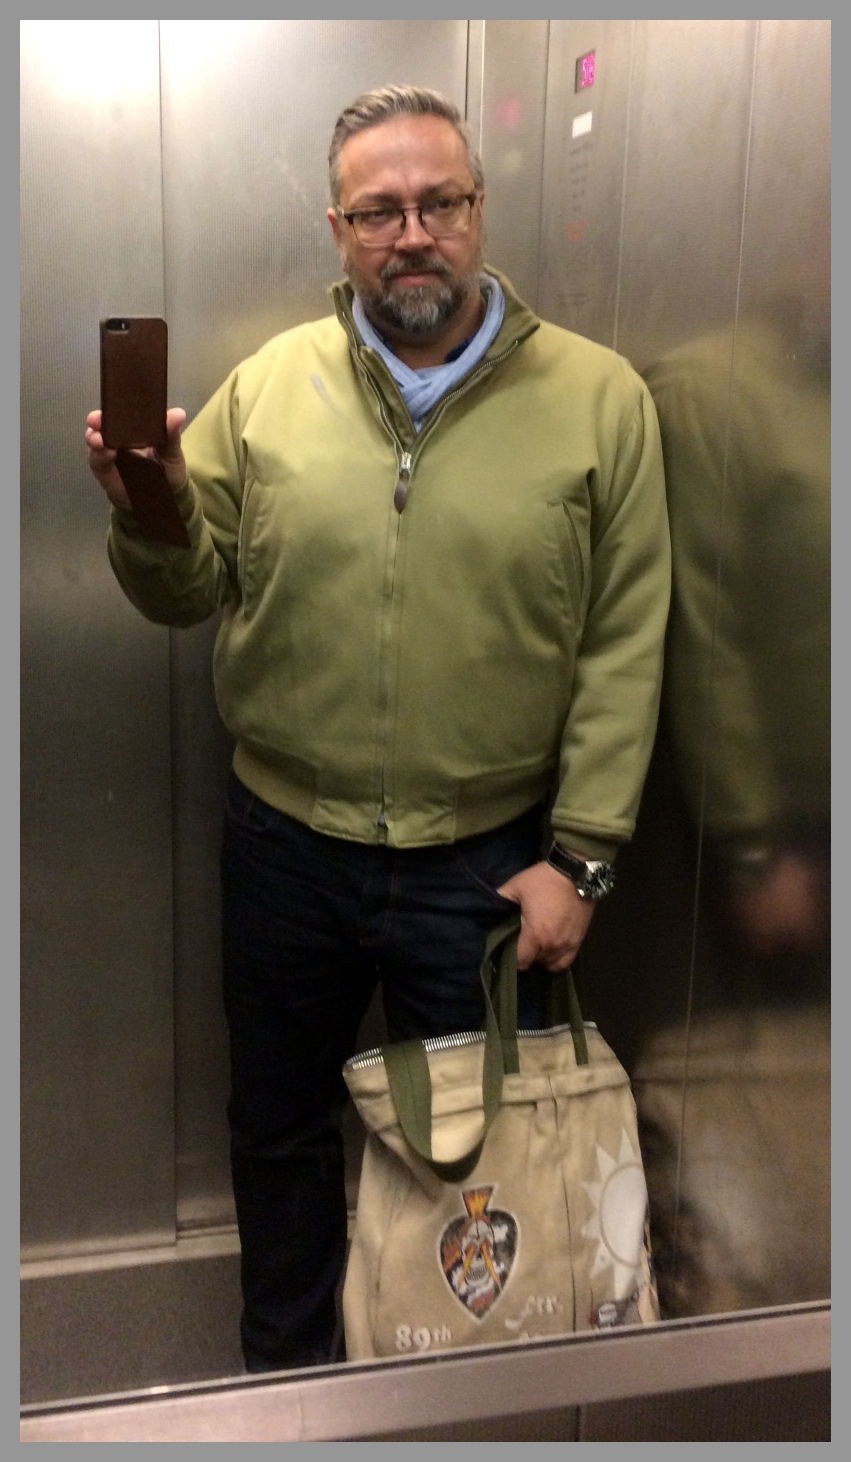 elevator_25092018.jpg